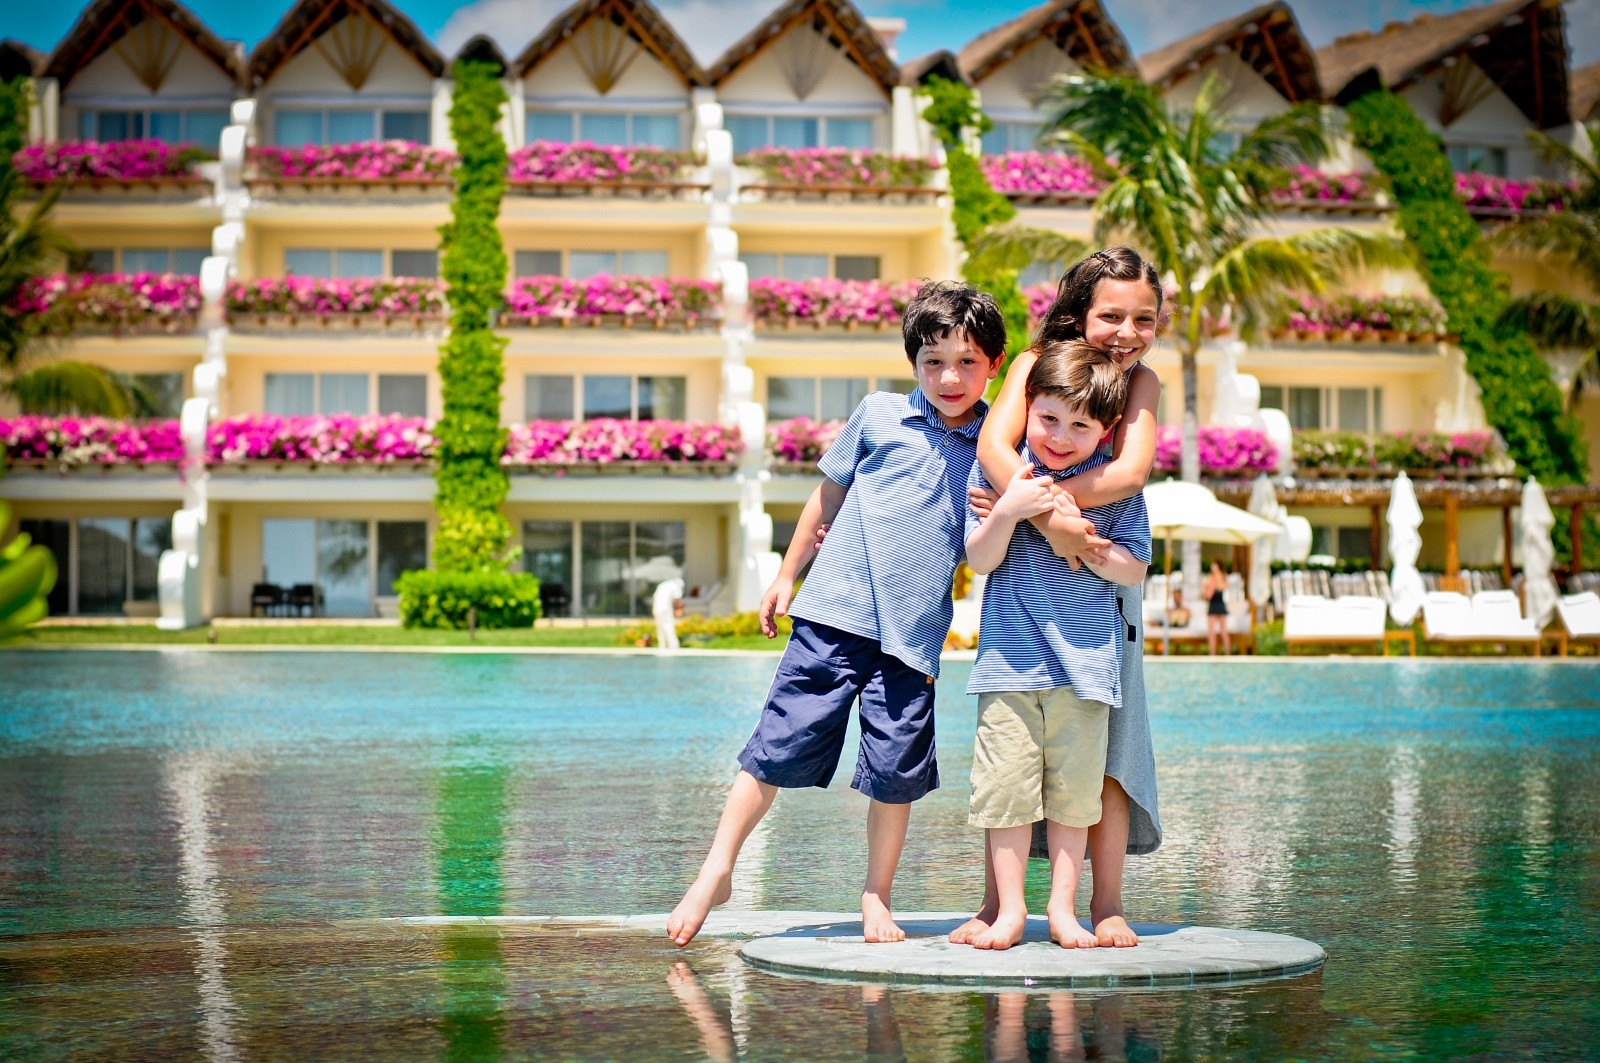 Travel Agency All-Inclusive Resort Grand Velas Riviera Maya 082